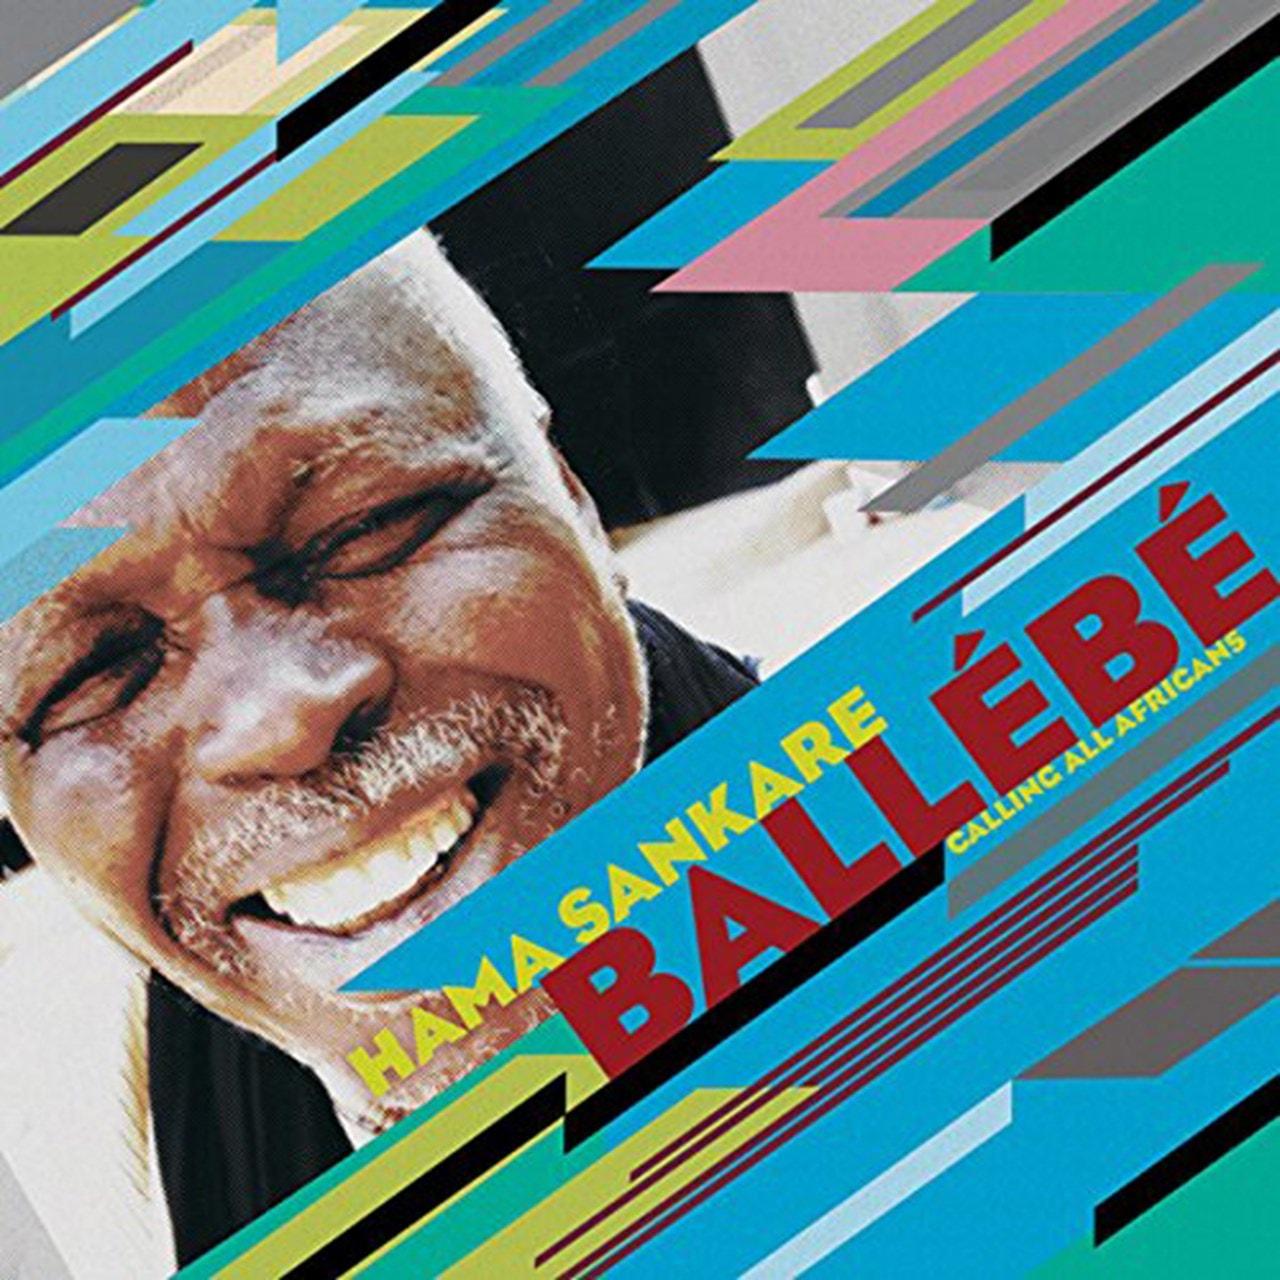 Ballebe: Calling All Africans - 1